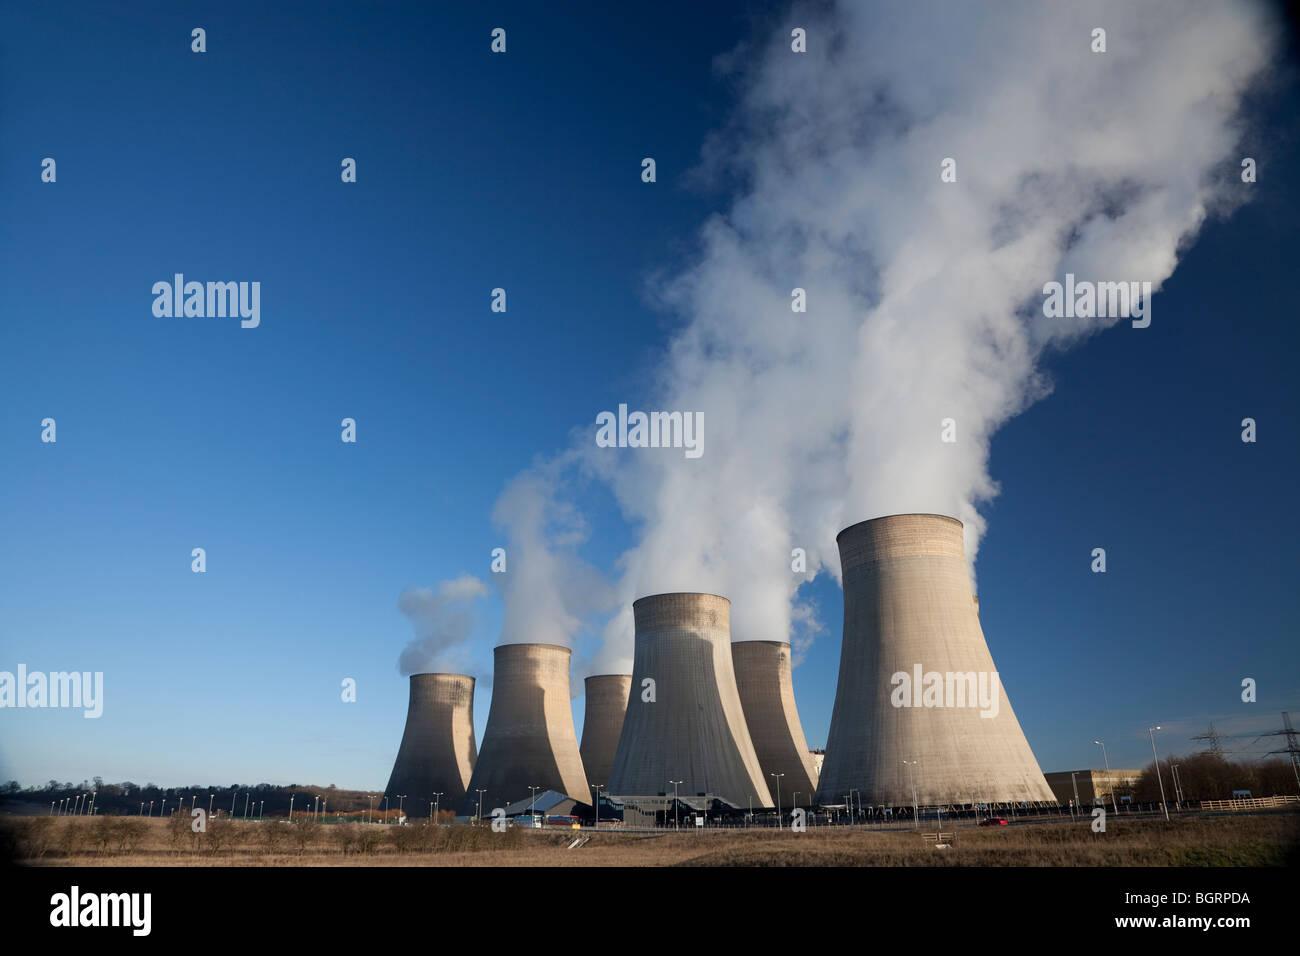 Ratcliffe on Soar coal fired power station. Ratcliffe, Nottinghamshire, UK - Stock Image